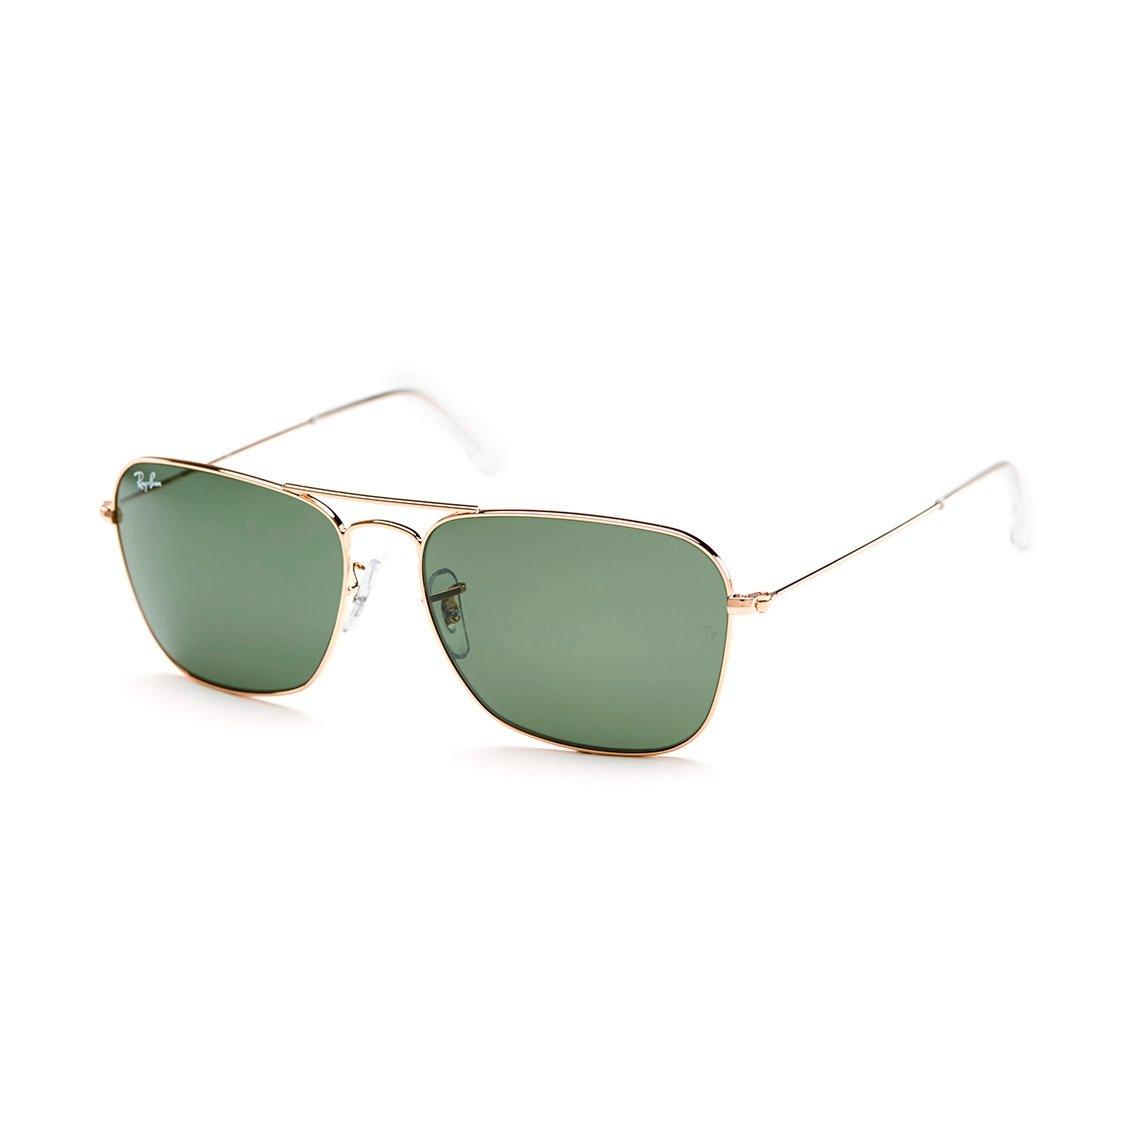 Купить очки ray-ban в краснодаре